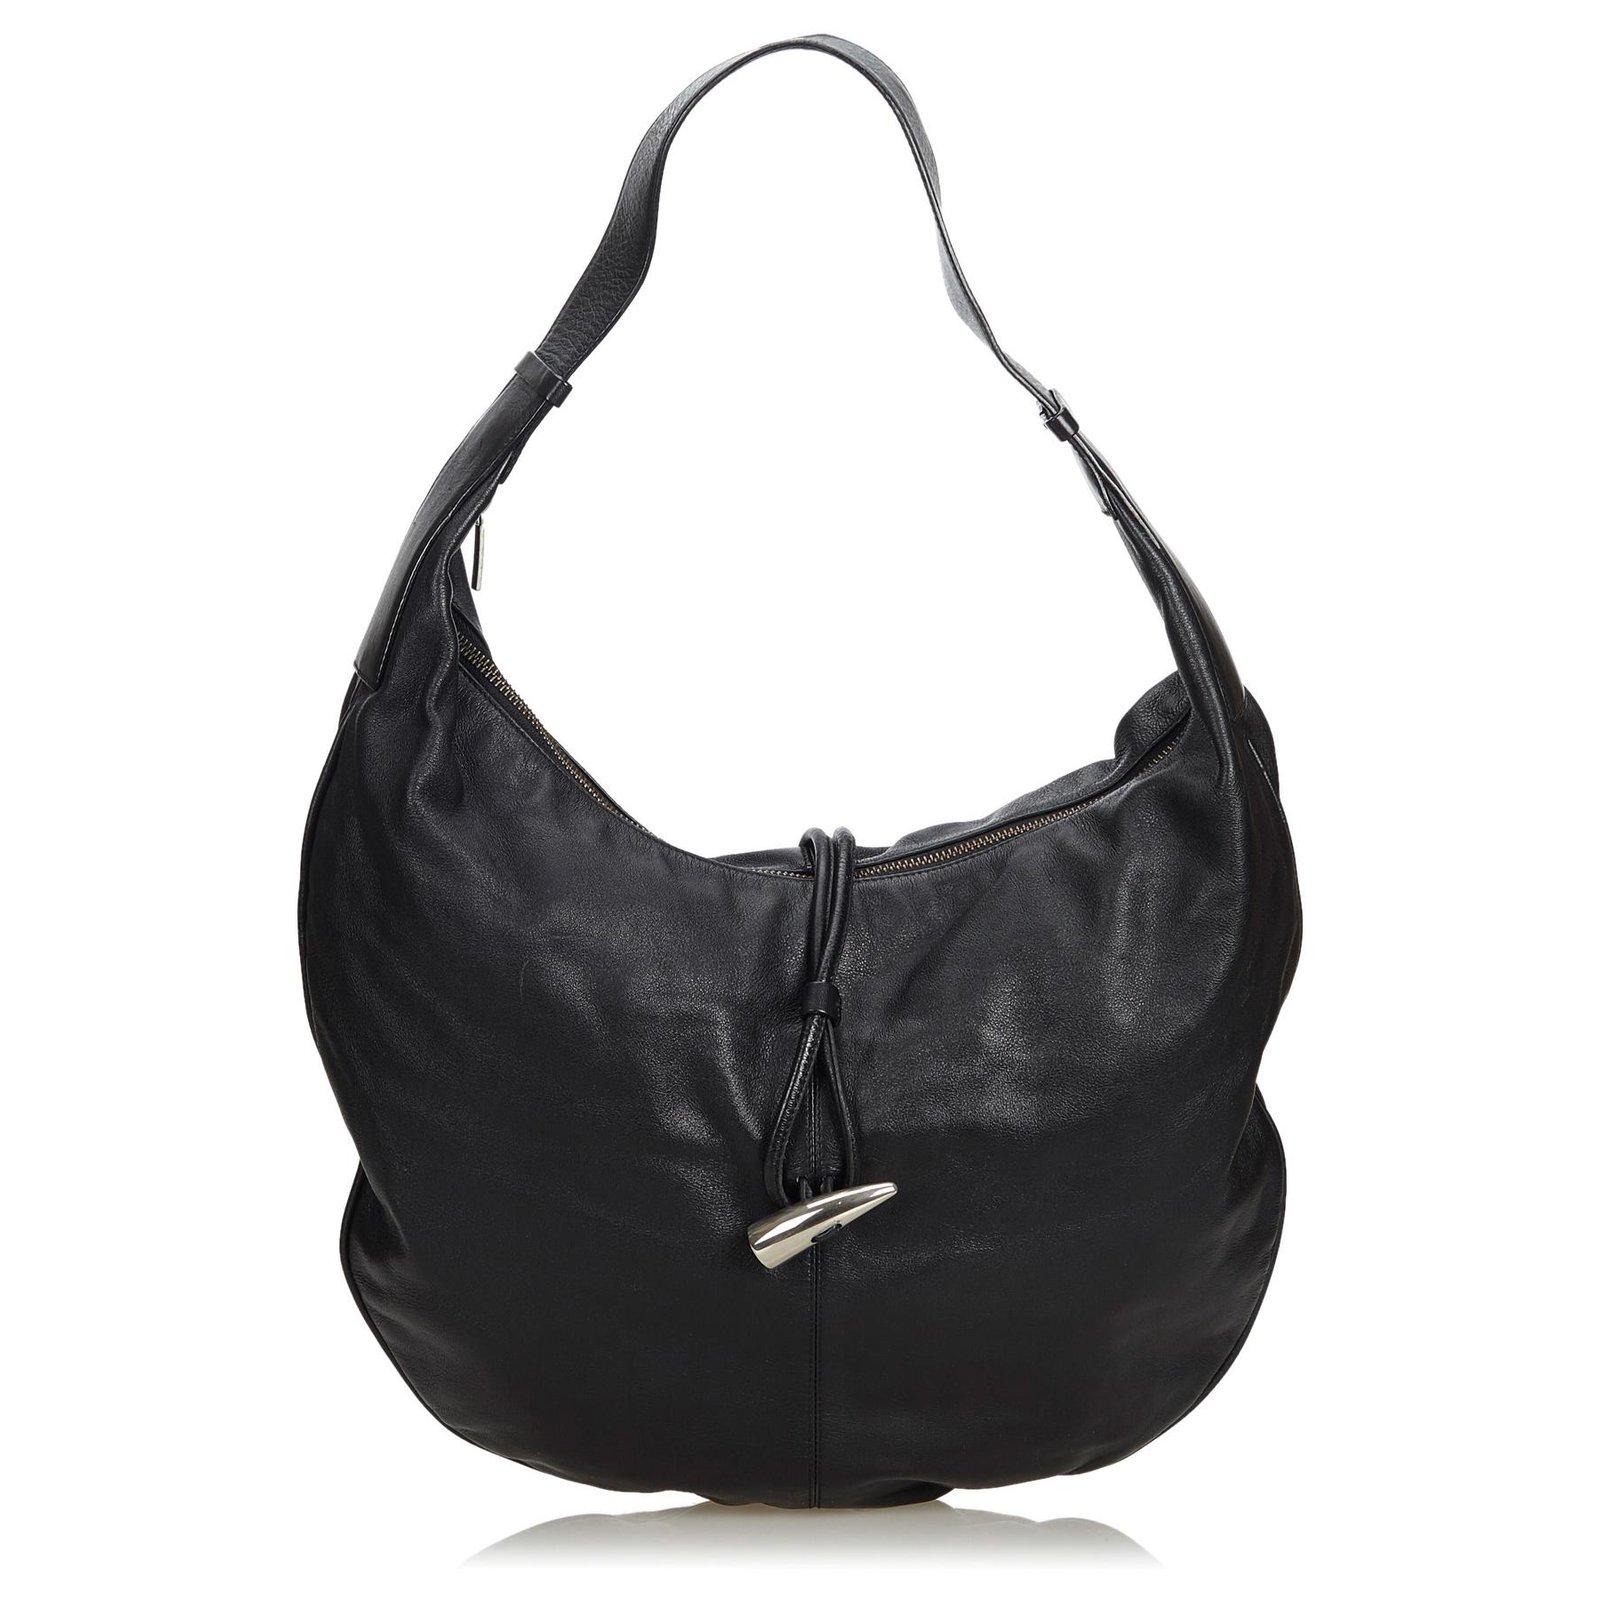 0df5493ef Burberry Burberry Black Leather Hobo Bag Handbags Leather,Other Black  ref.124367